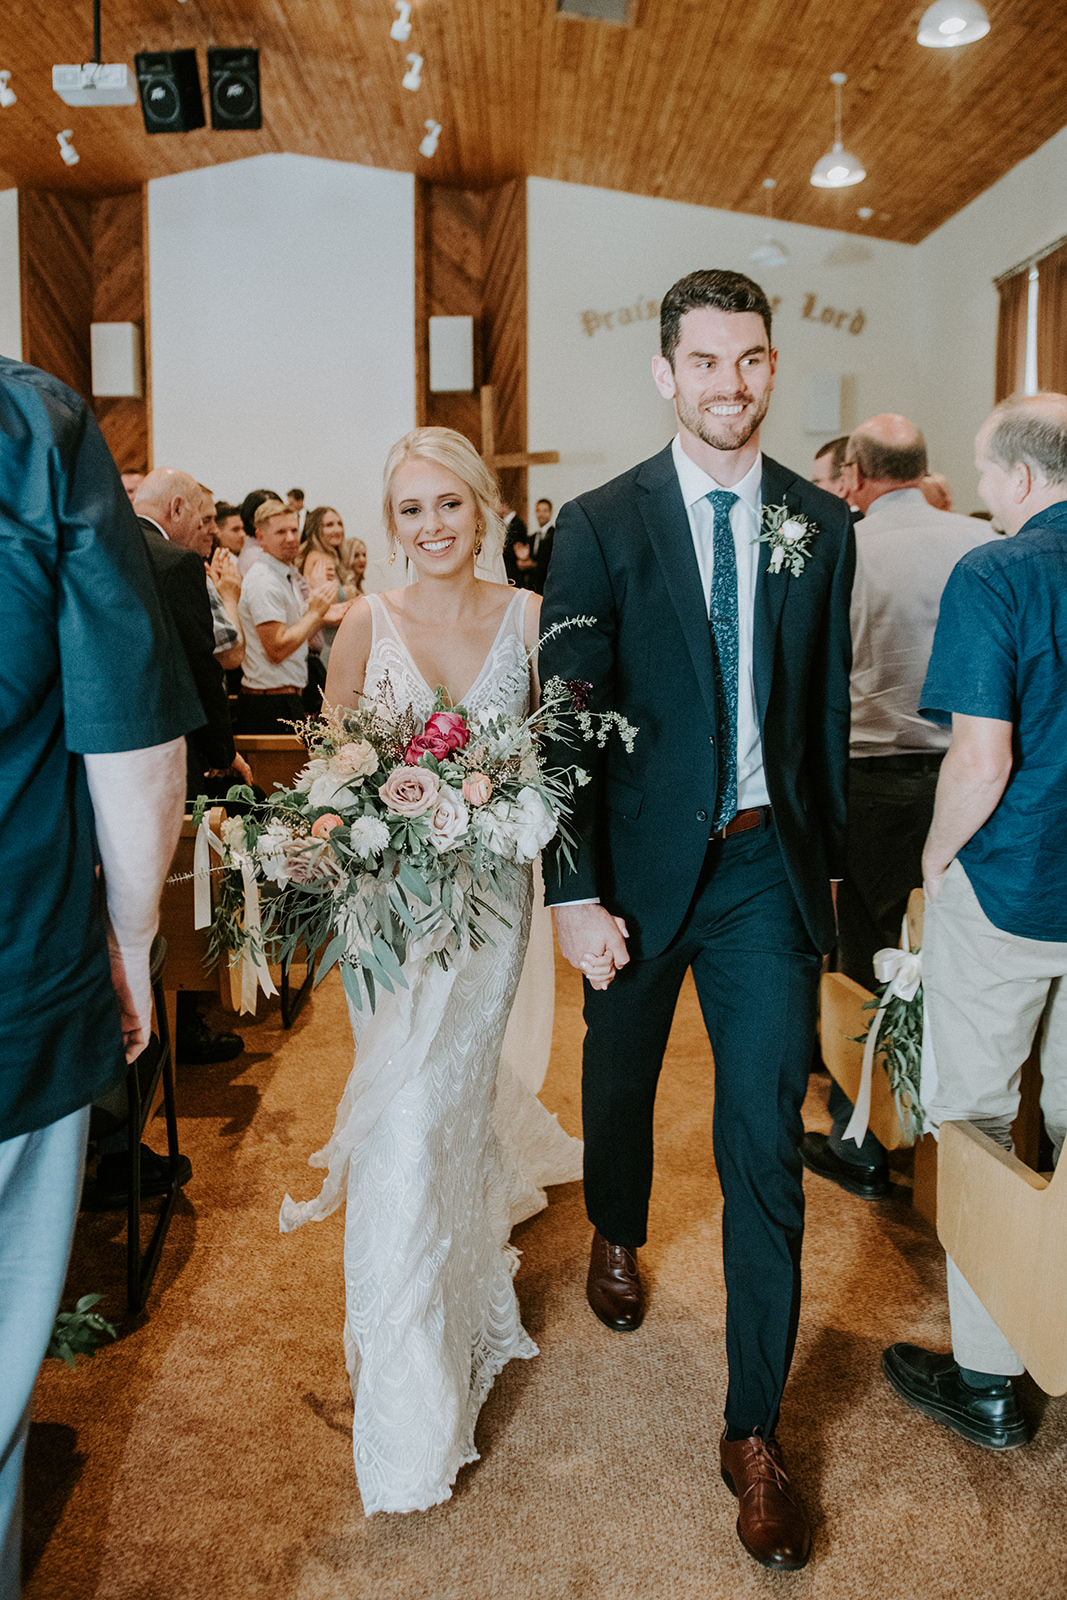 Prince Edward Wedding.Boho Inspired Wedding In Morell Prince Edward Island Item 26